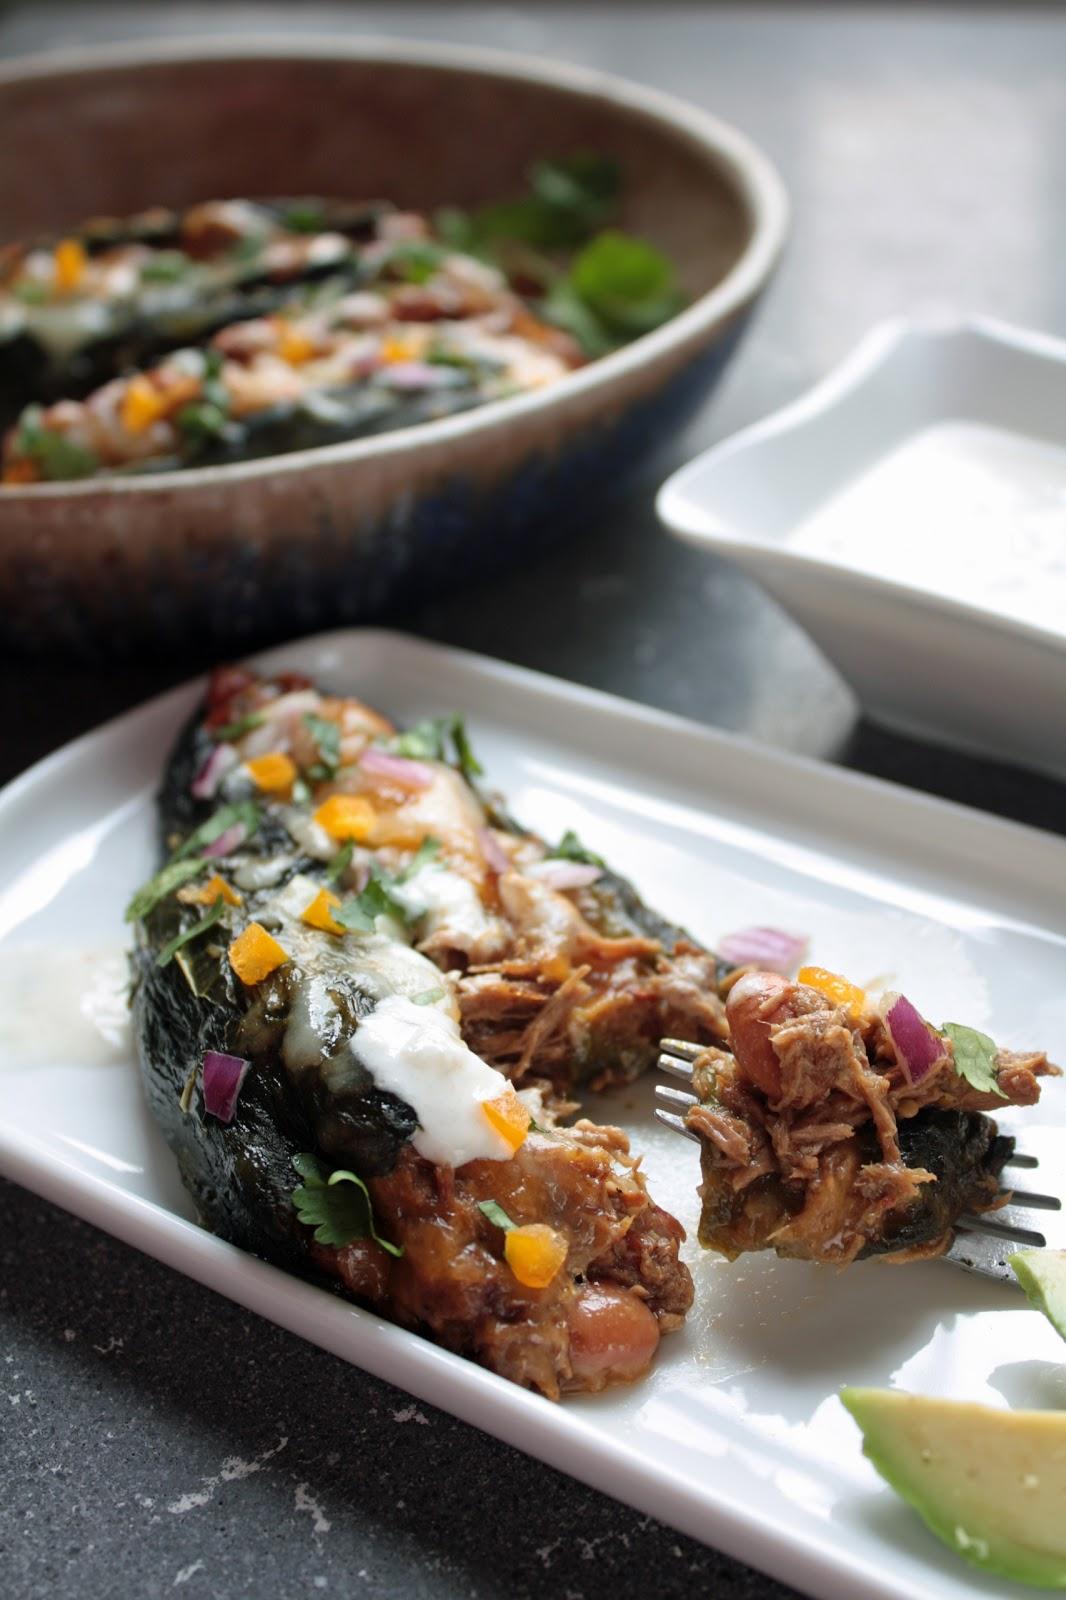 ... Poblanos Stuffed w/ Pulled Pork Chili Verde   I Breathe I'm Hungry